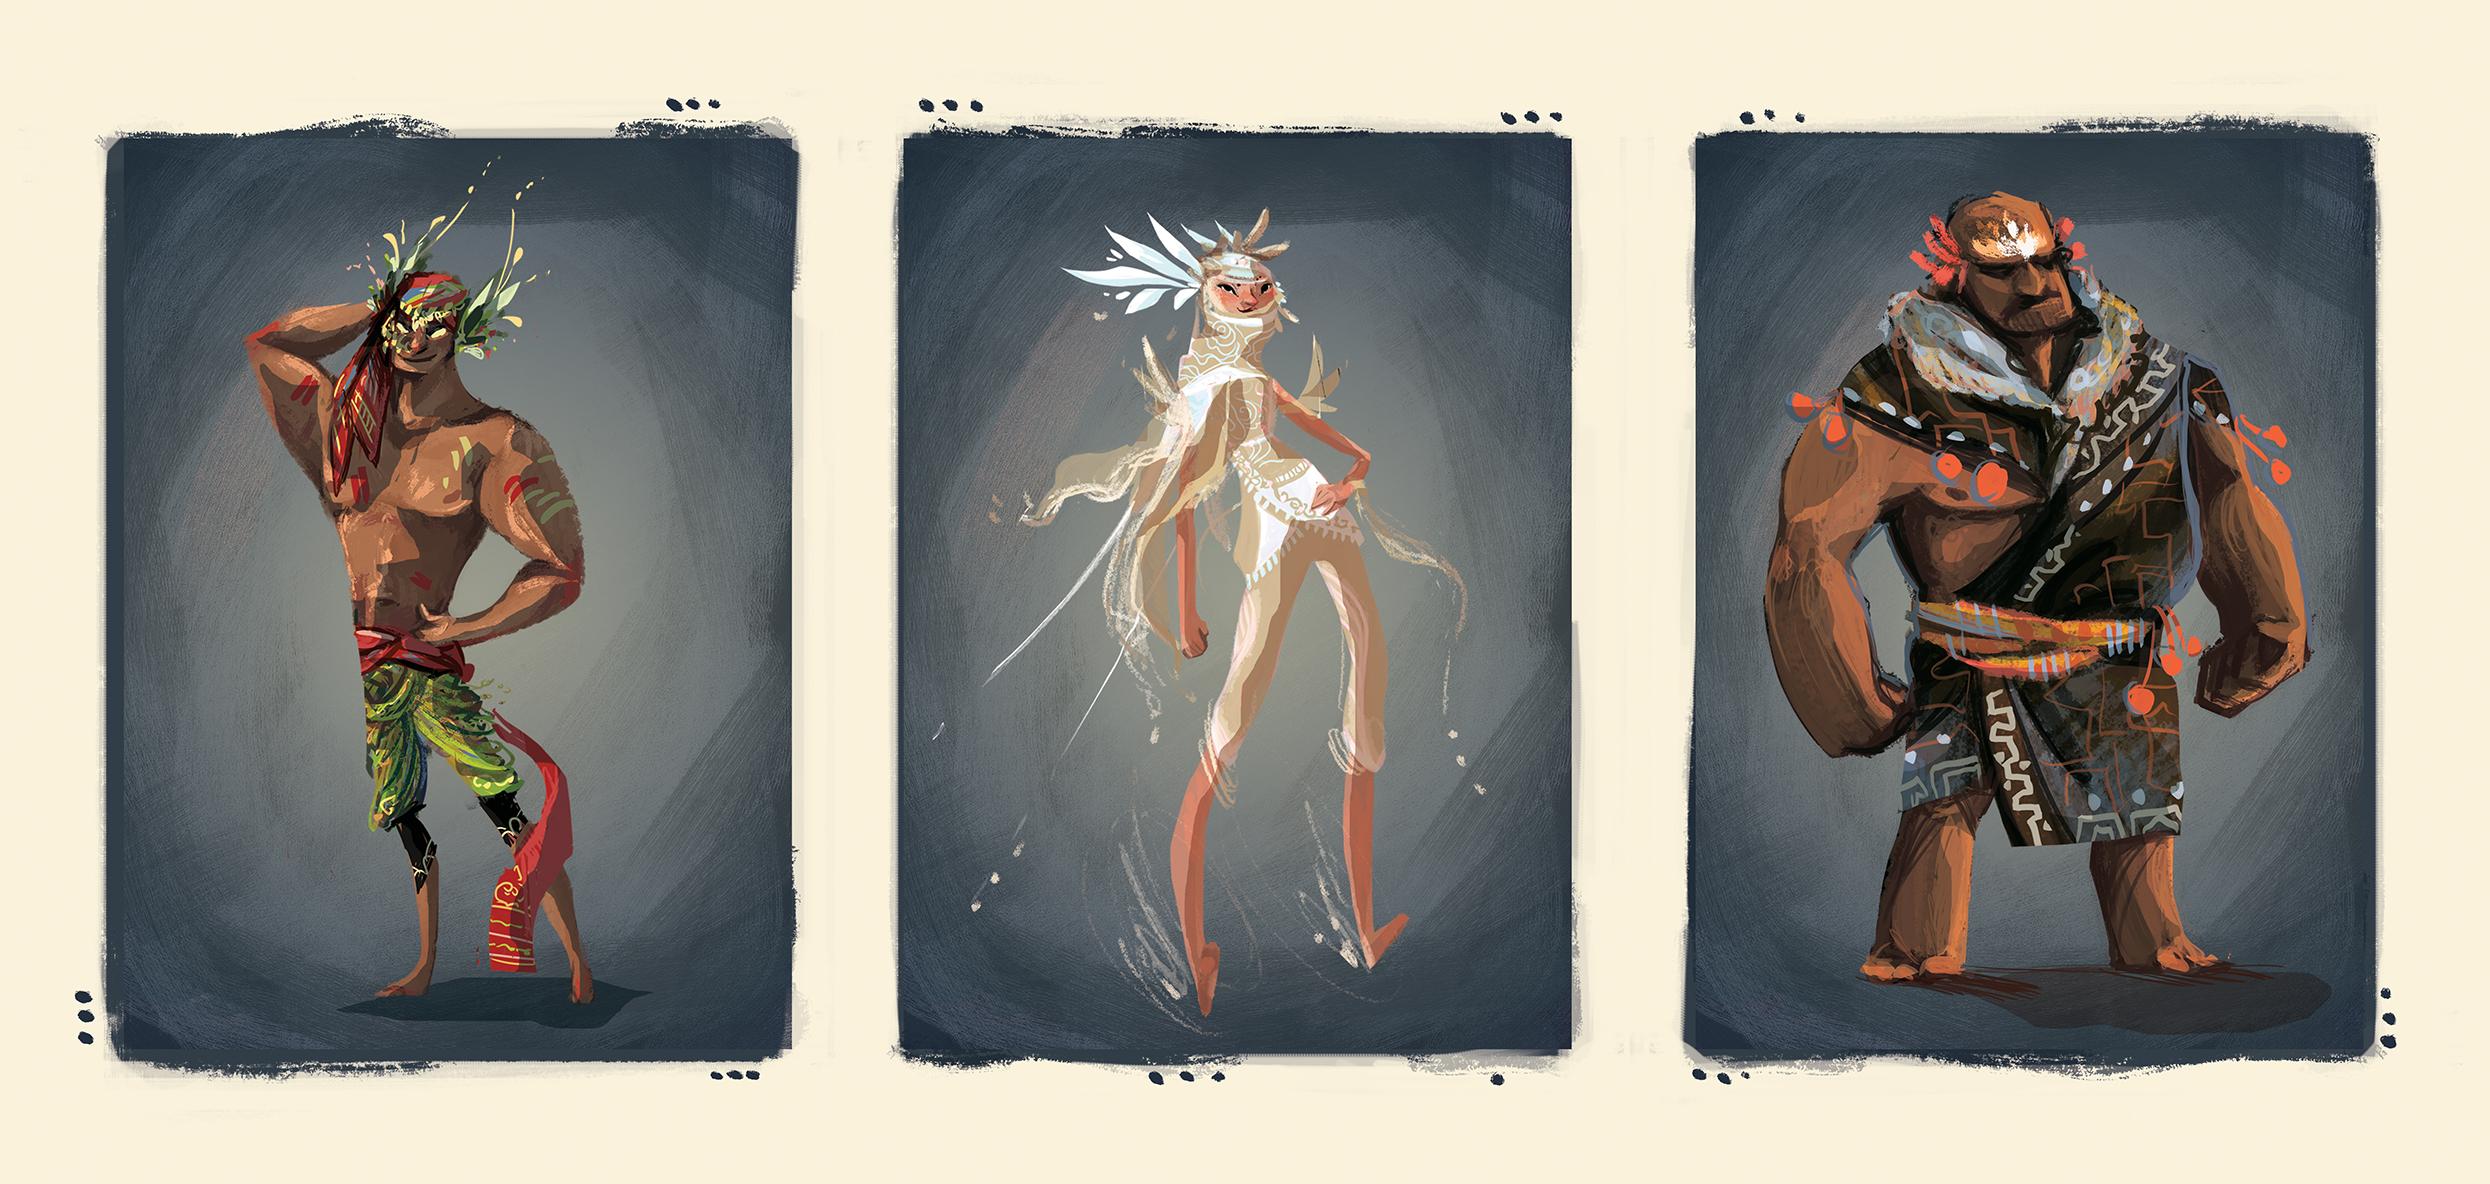 3 character final designs